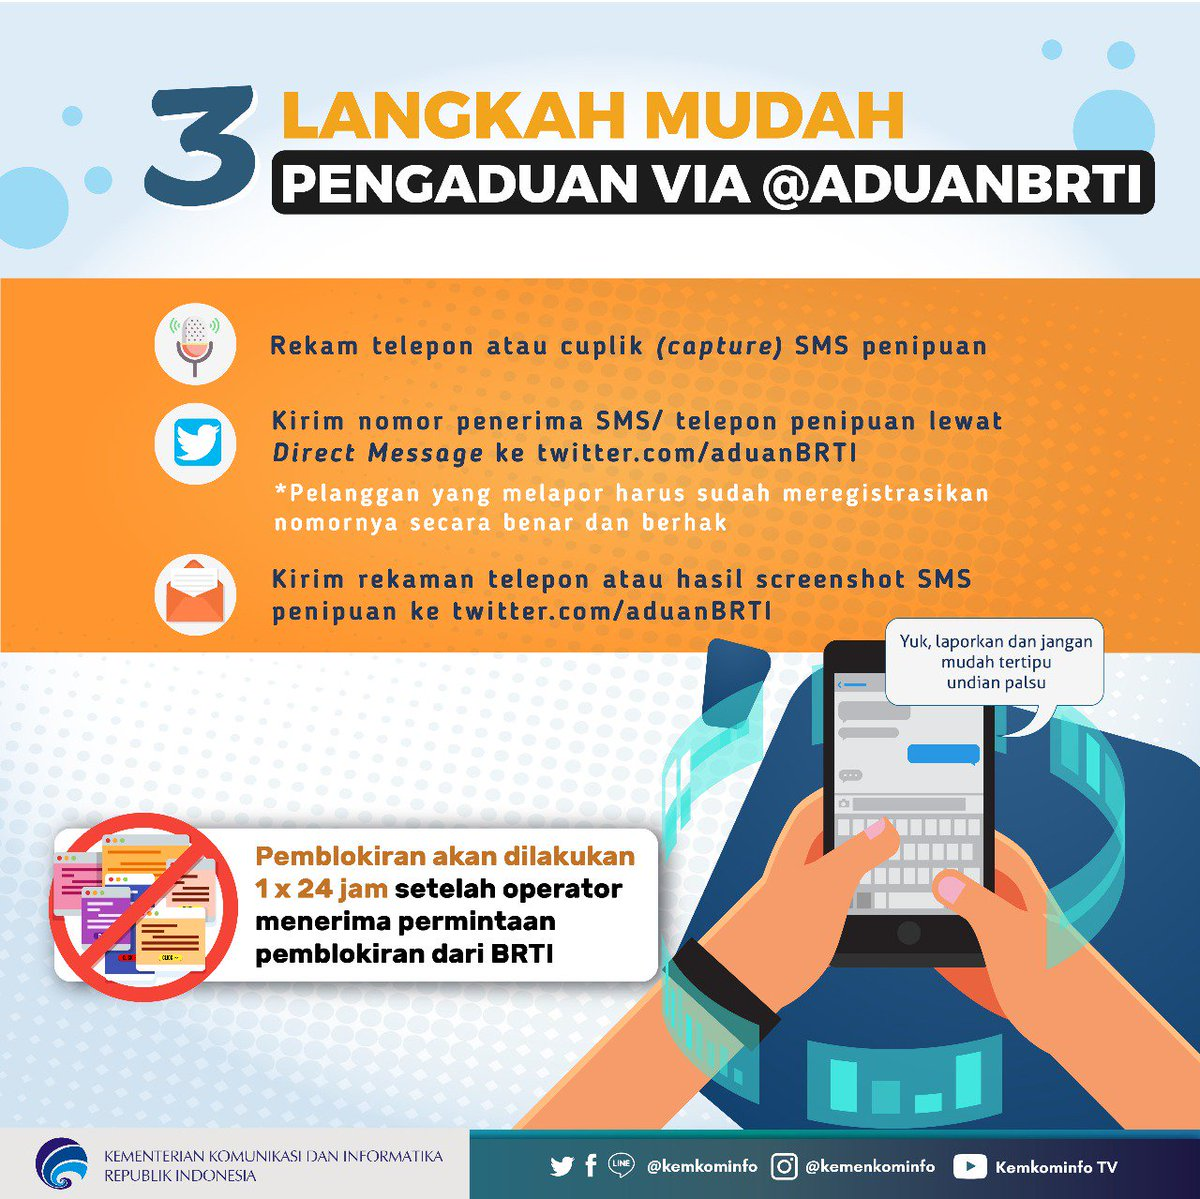 Kementerian Kominfo On Twitter Bosen Terima Sms Telp Penipuan